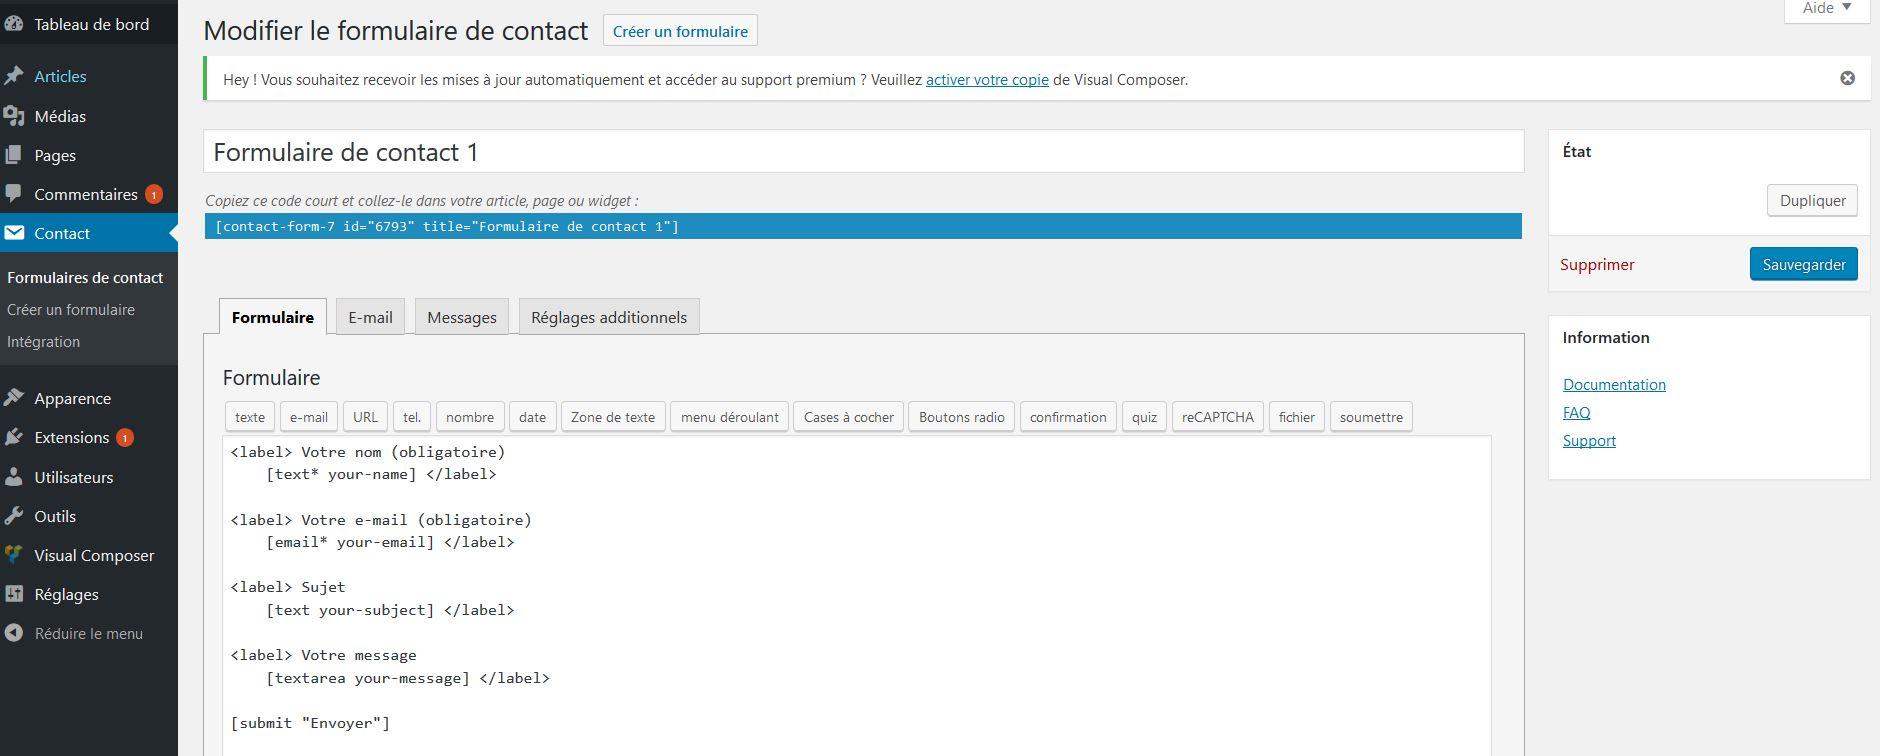 Utiliser une extension dans WordPress